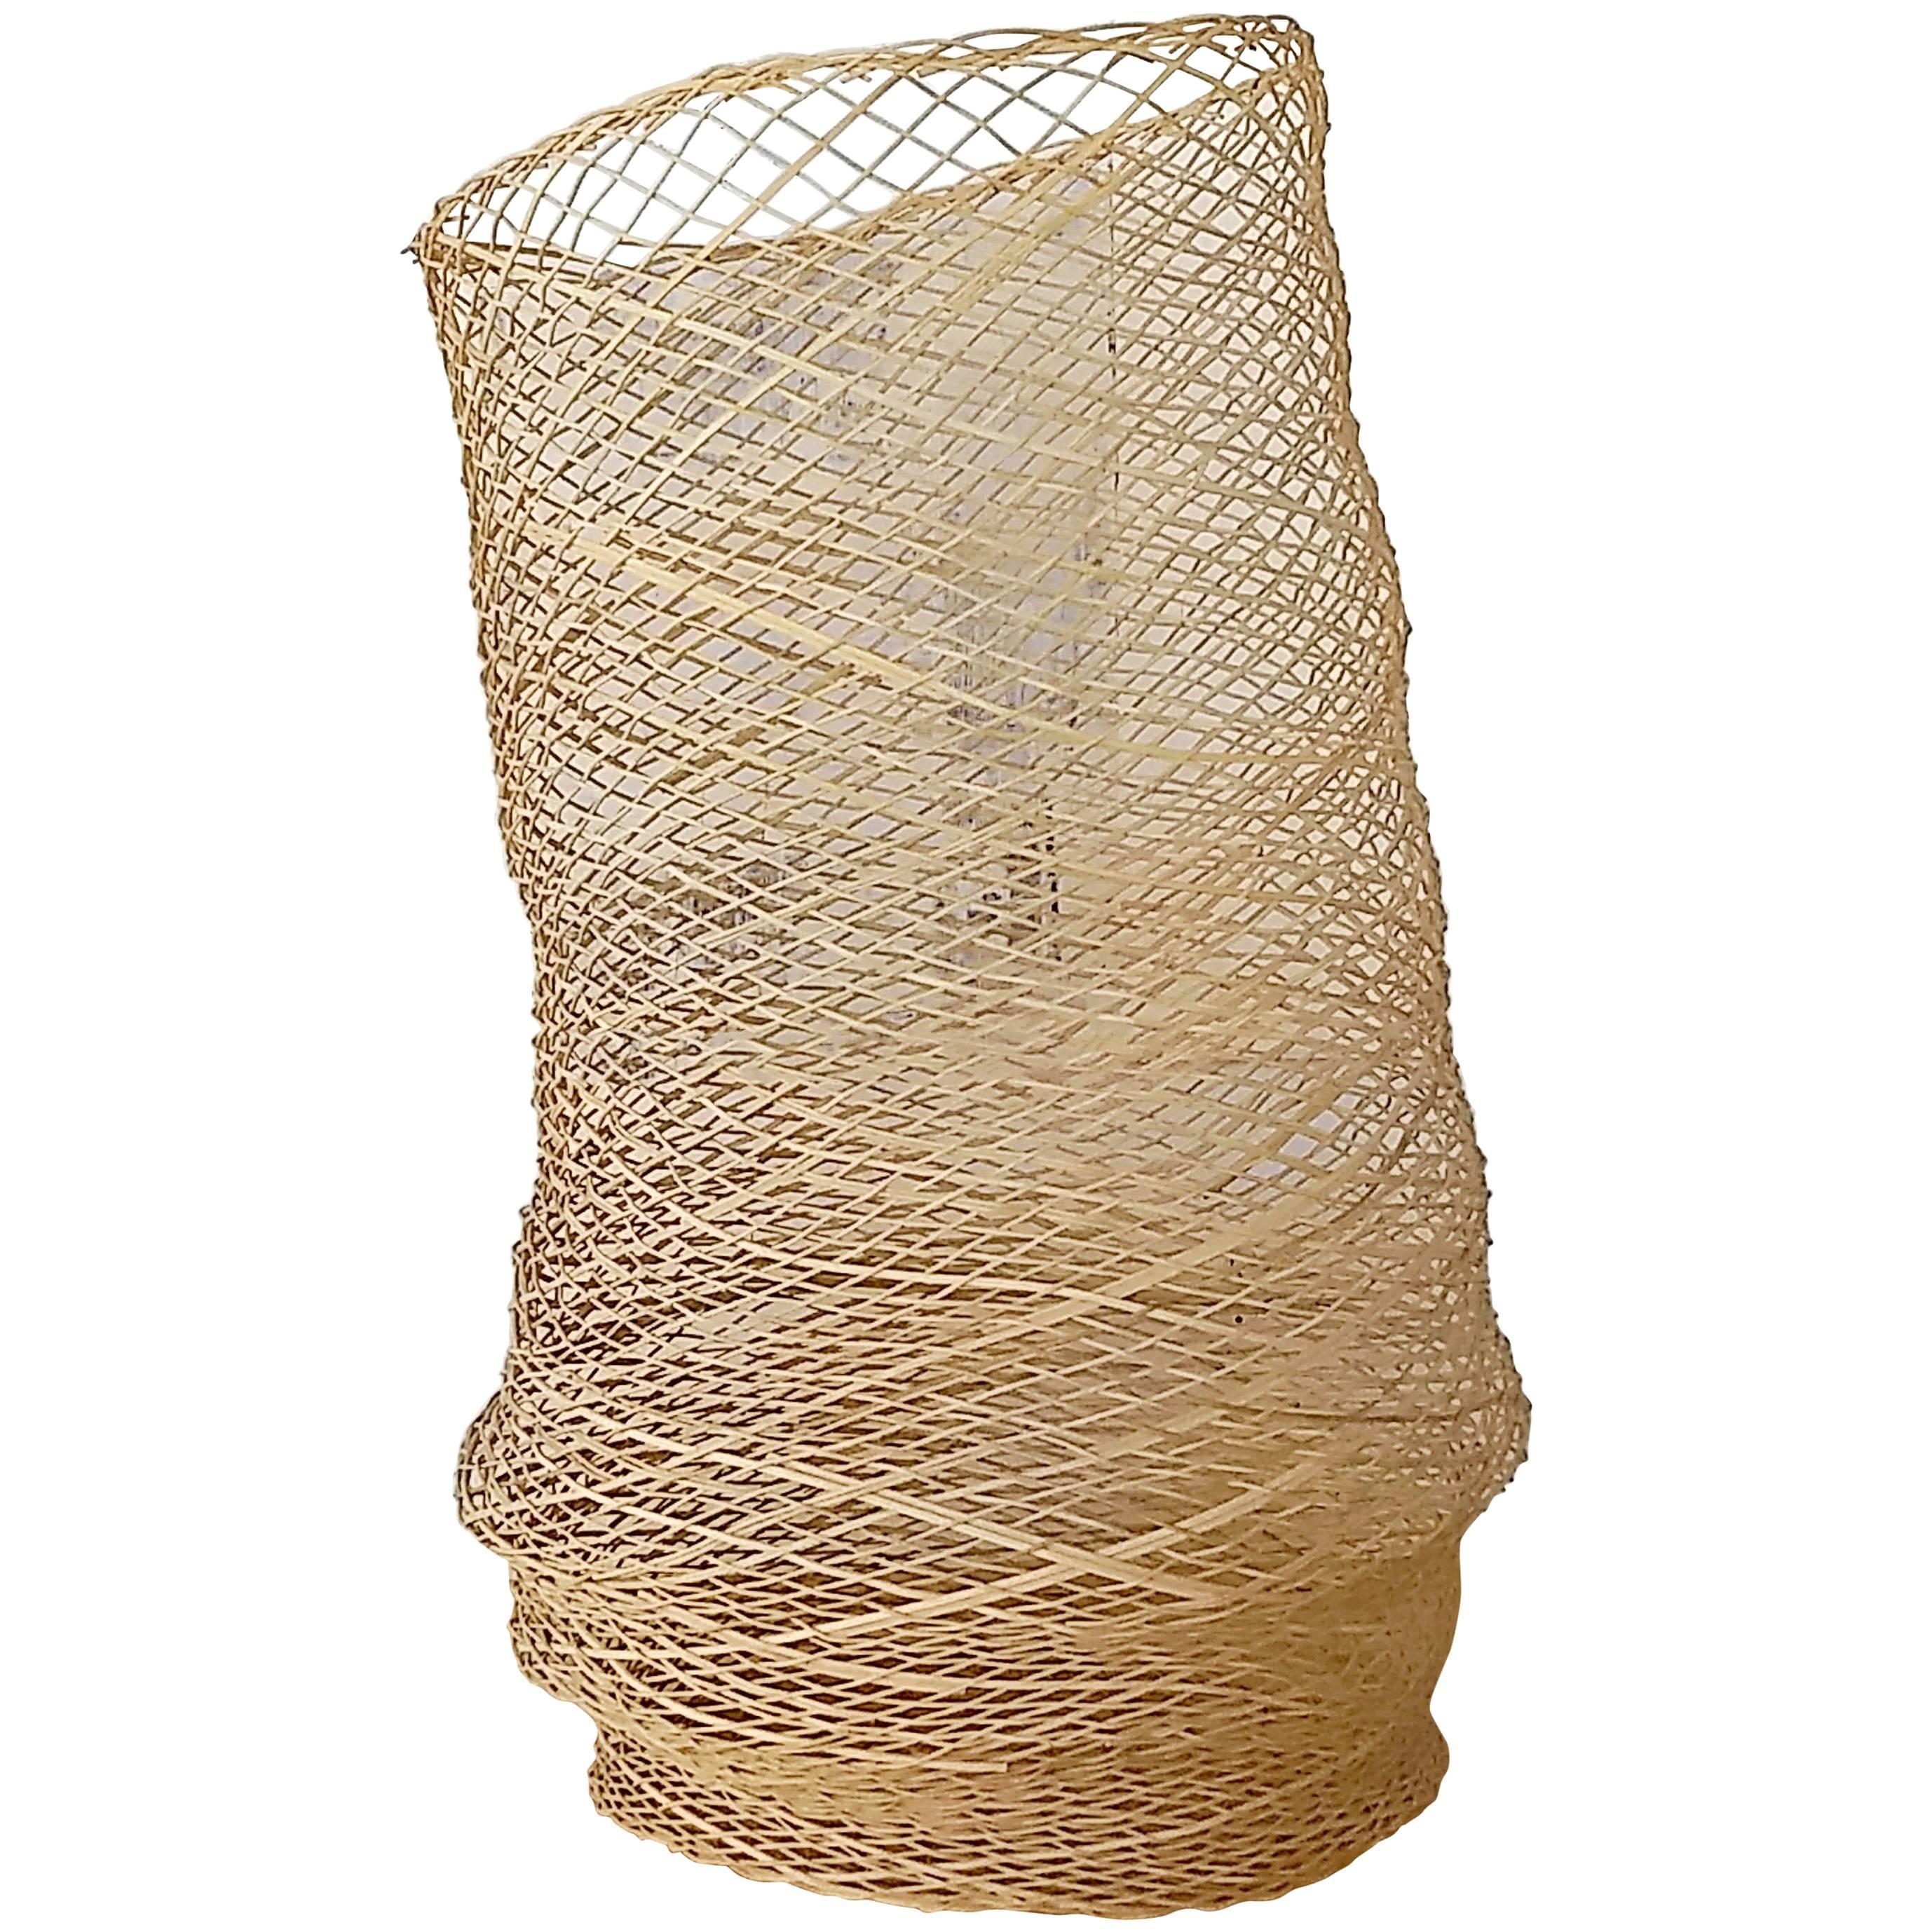 Linda Kelly Contemporary Woven Basket Standing Floor Art Sculpture